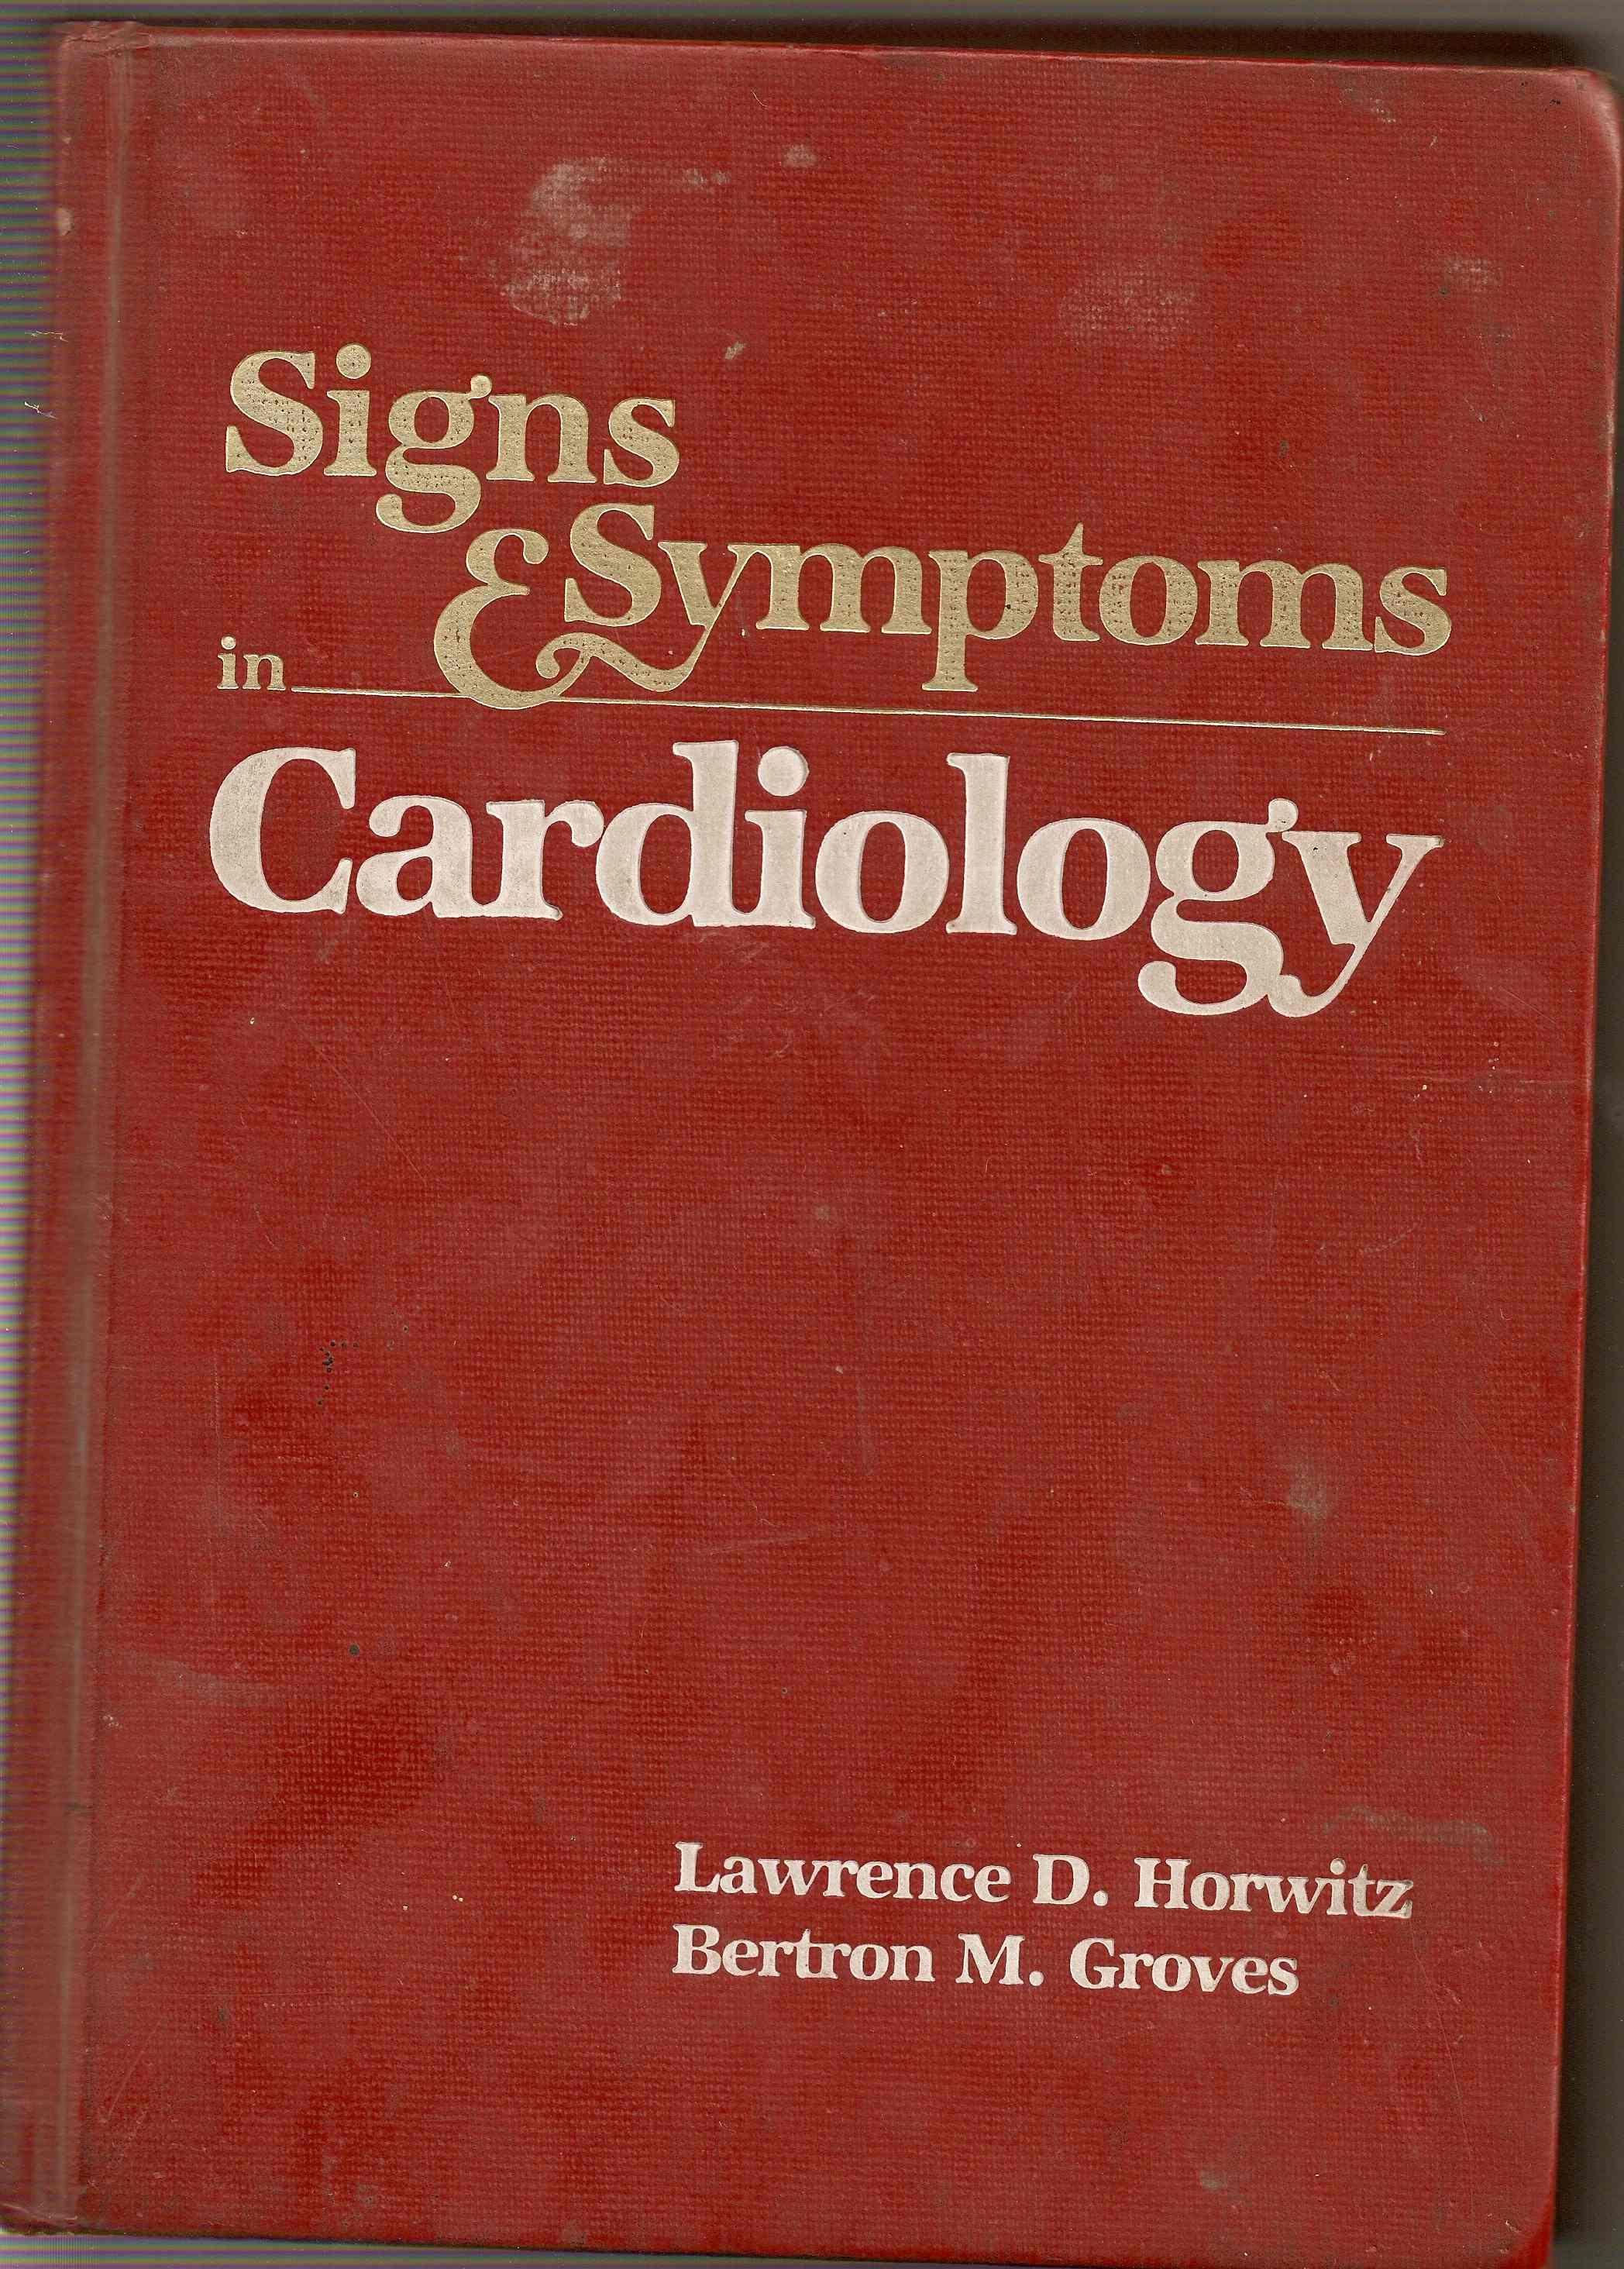 Learn the Heart   LearntheHeart.com